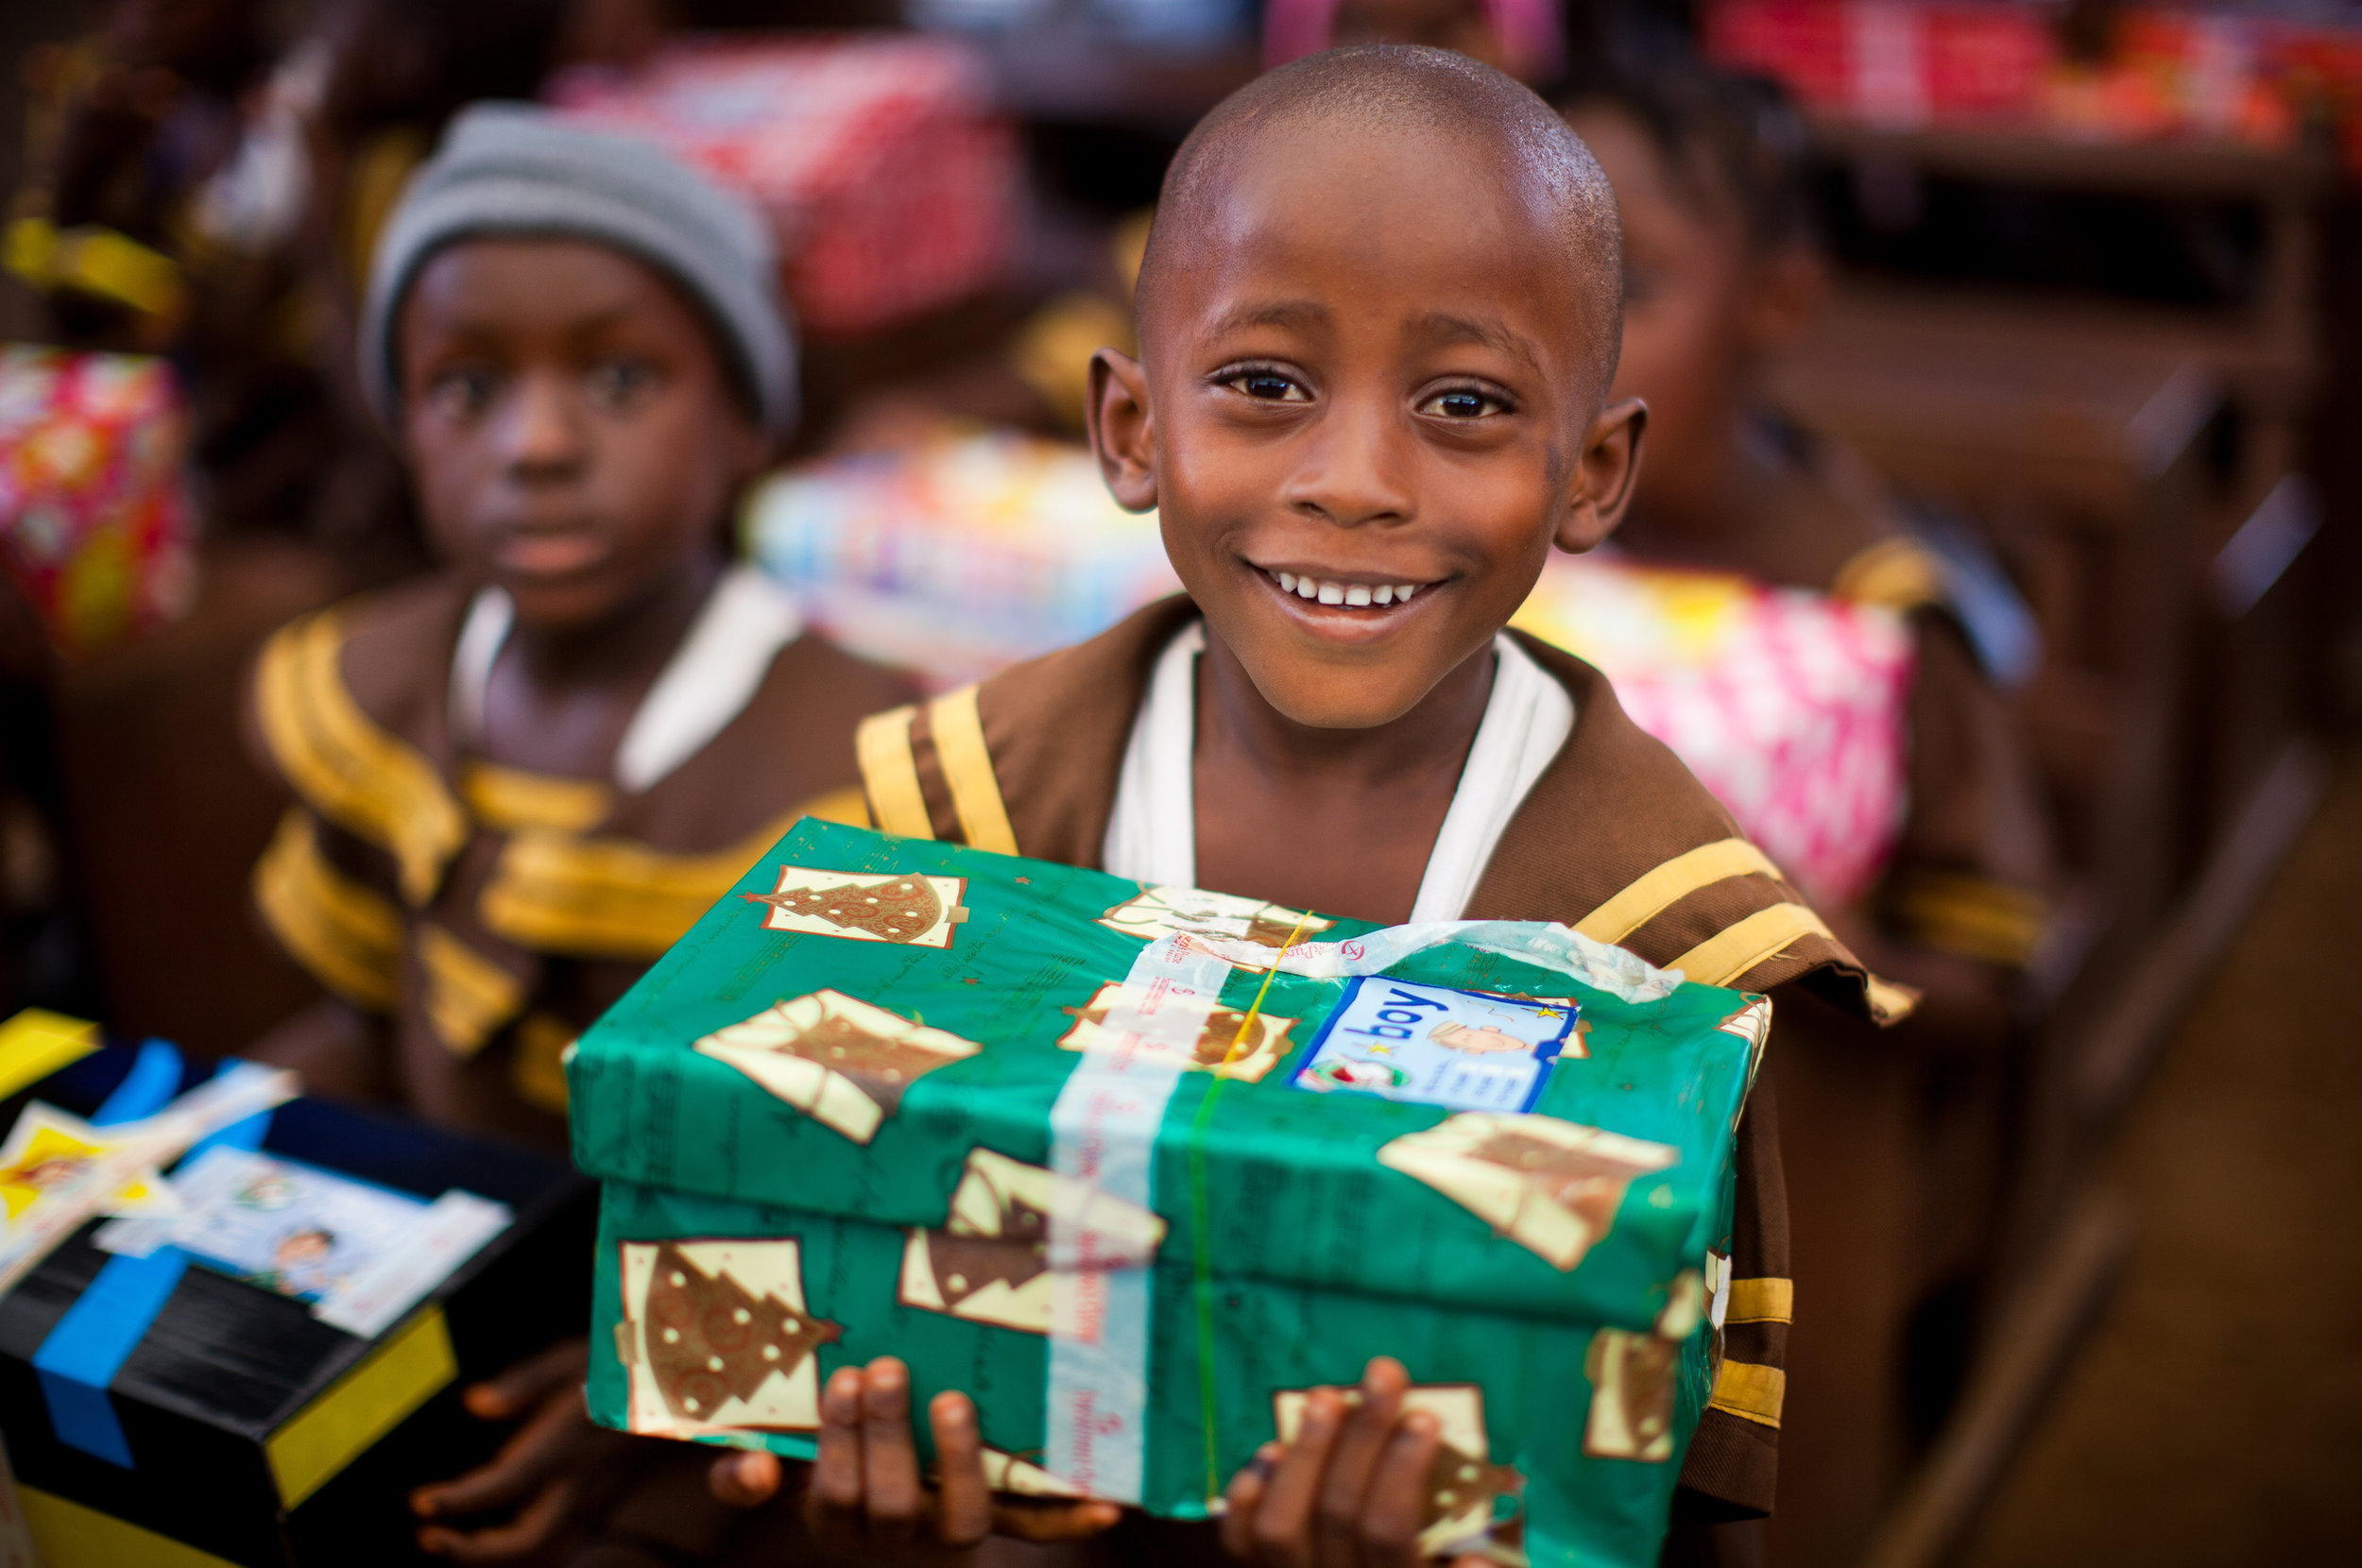 operation christmas child image2.jpg